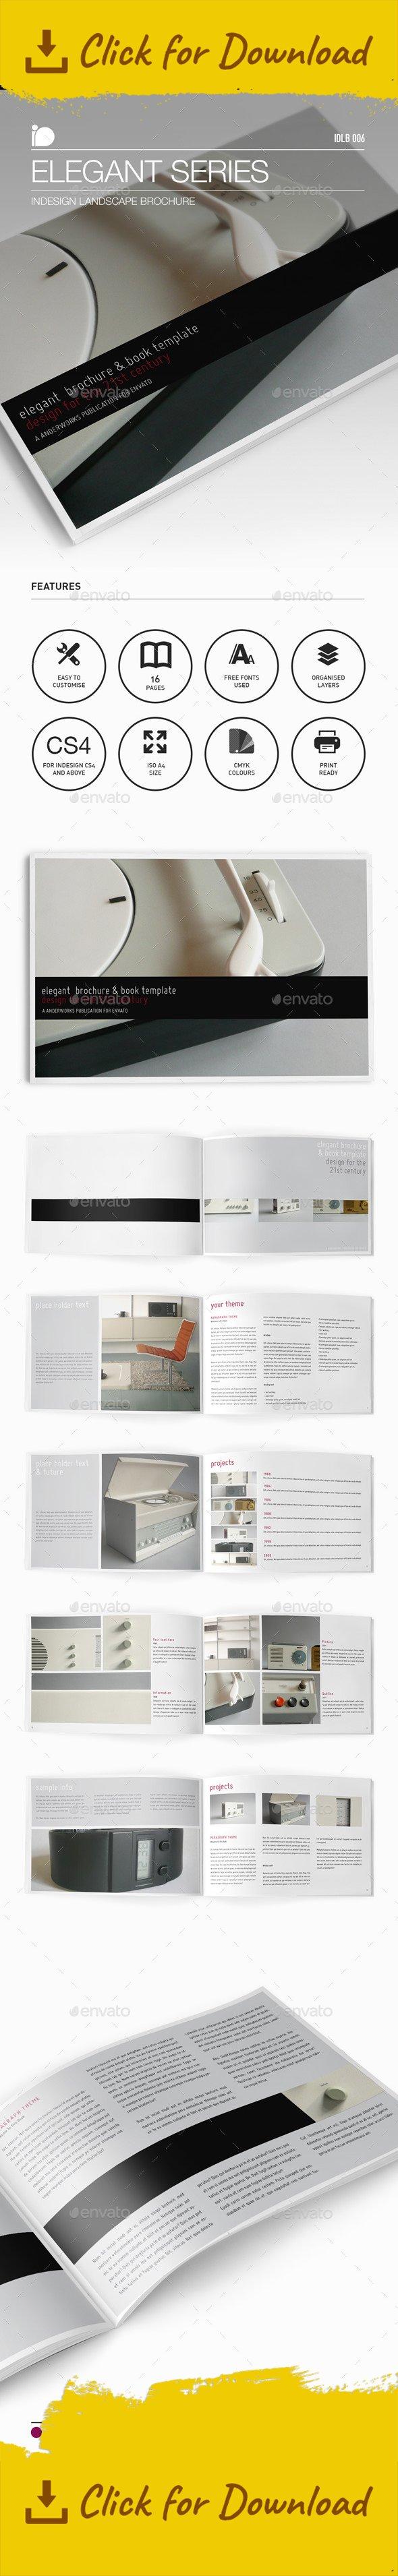 Landscape Brochure • Elegant Series | Brochures, Corporate brochure ...